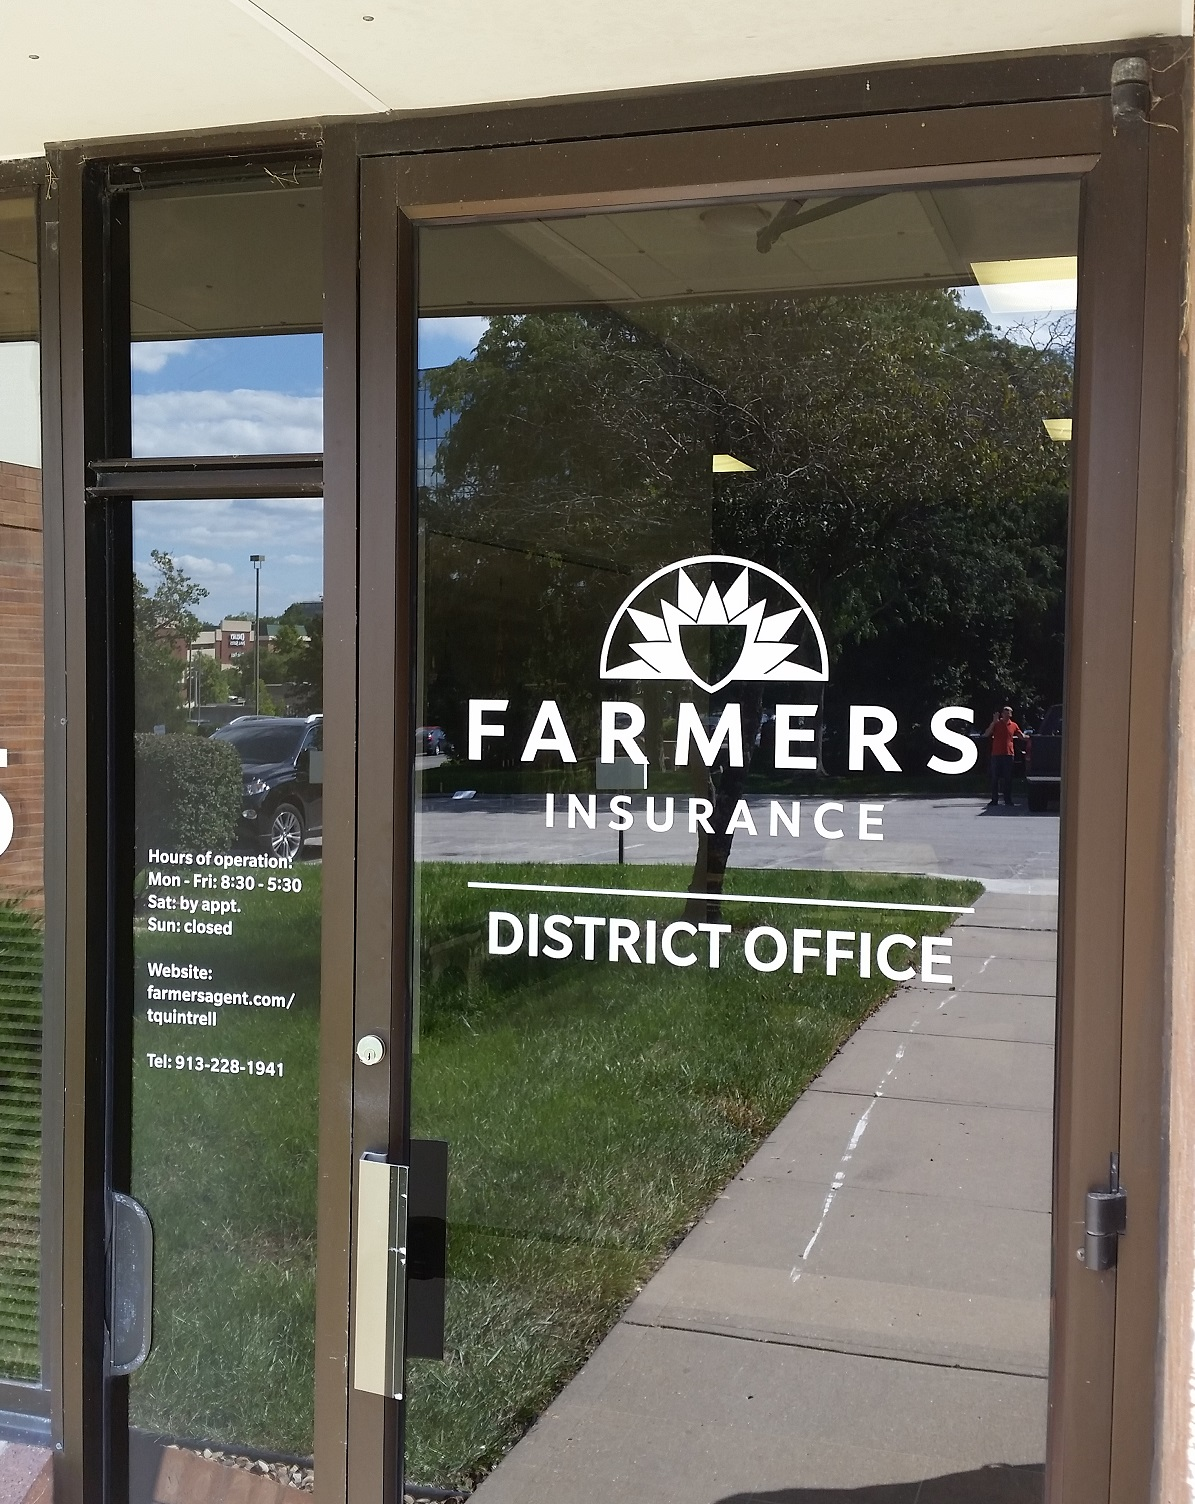 Farmers Insurance Corporate Office